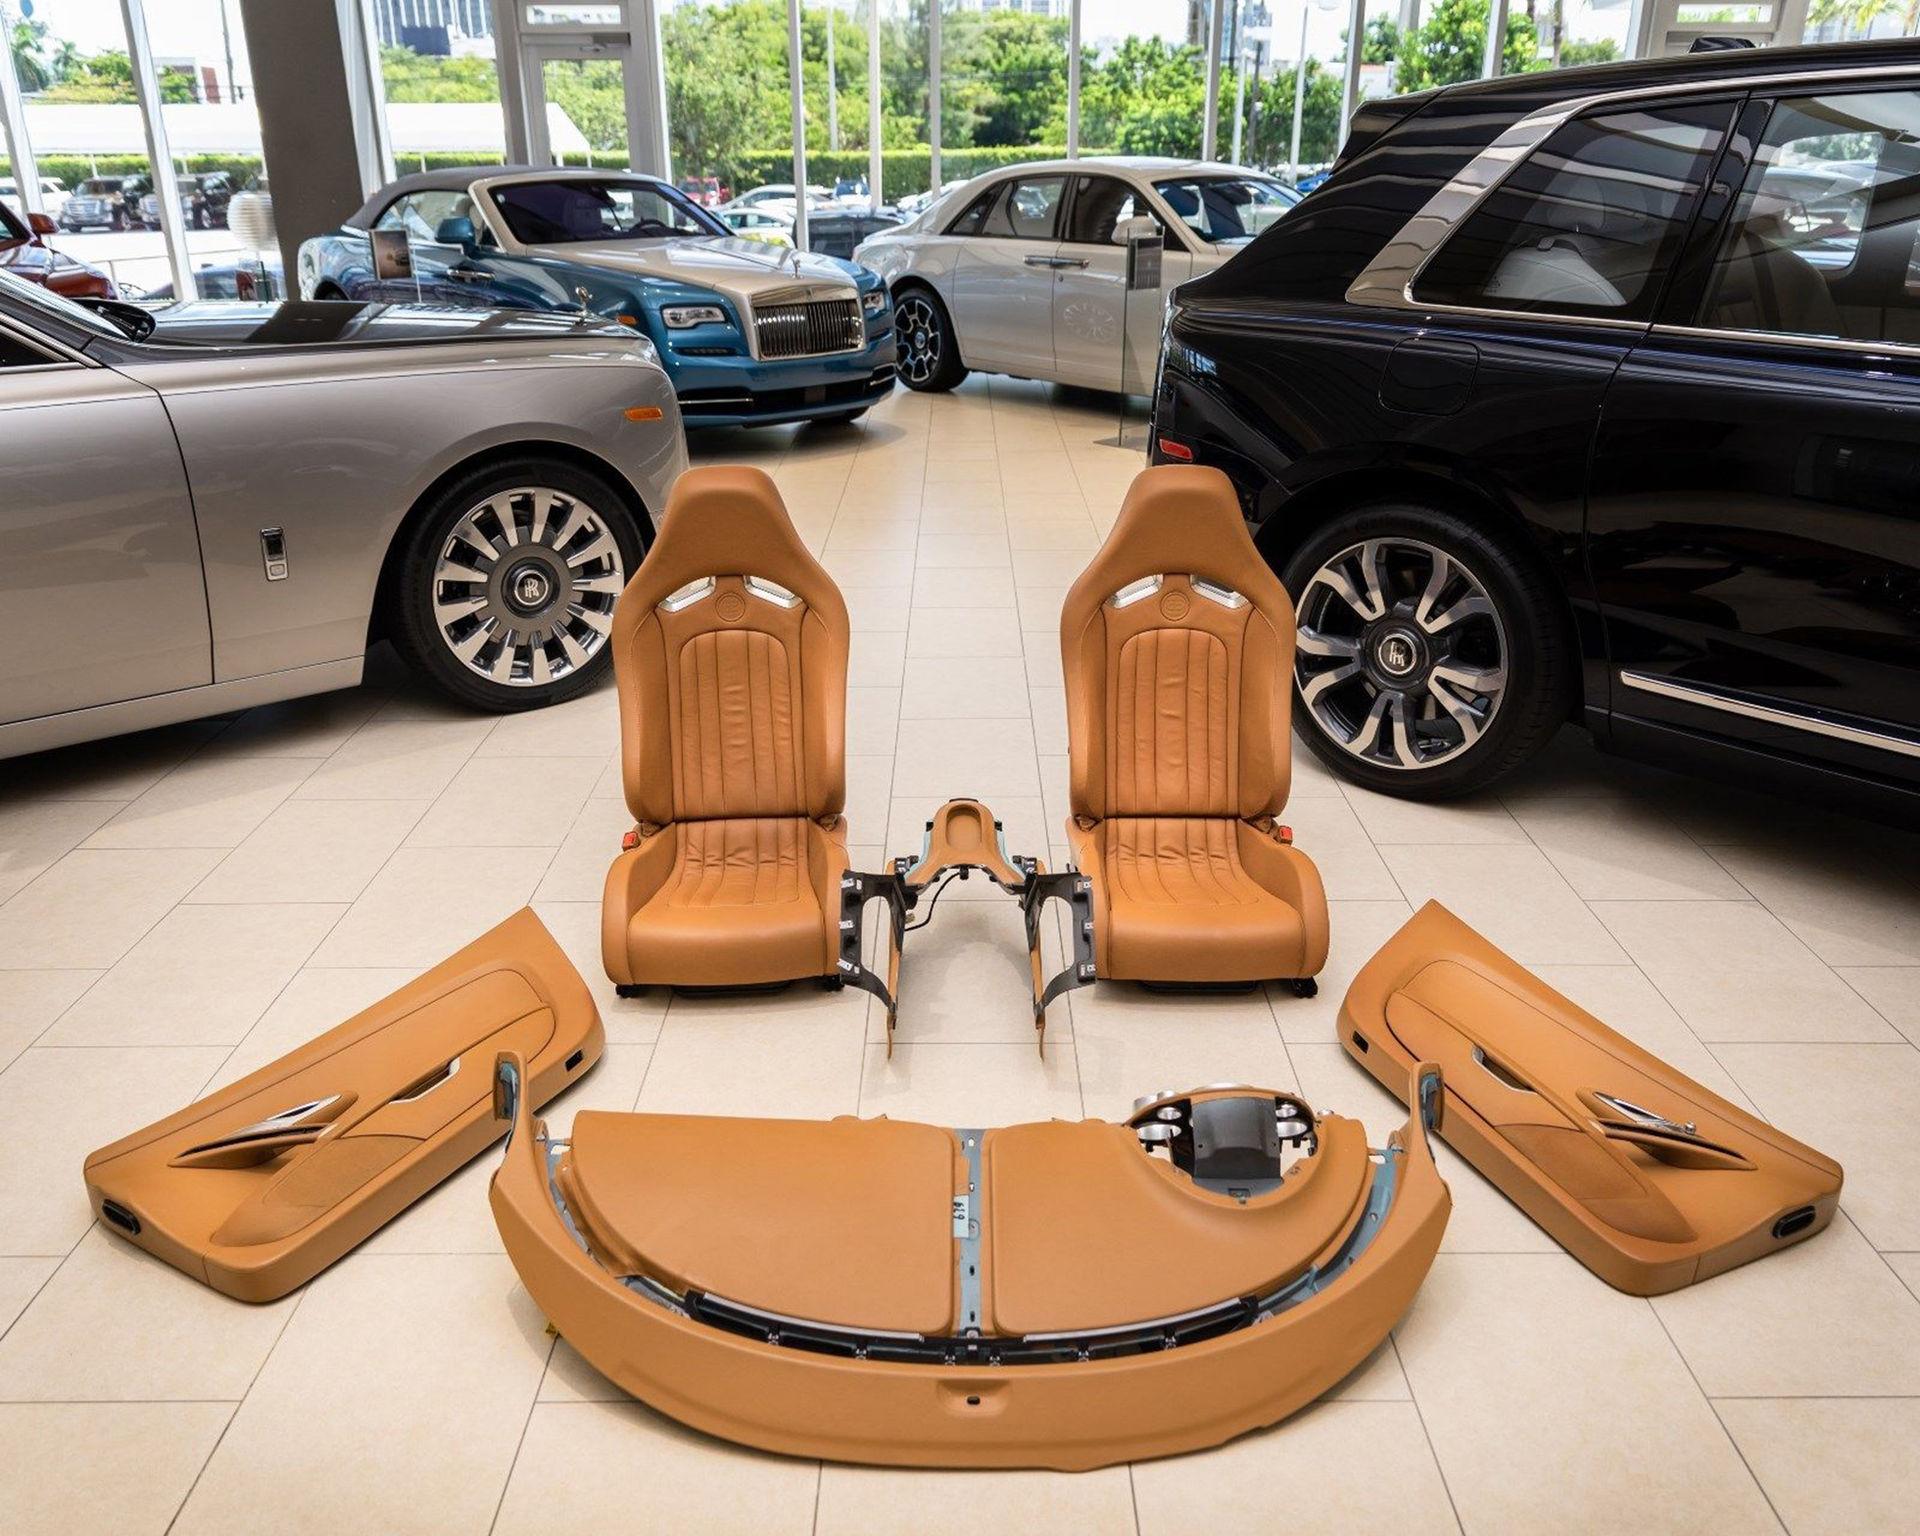 Inred vardagsrummet med Bugatti Veyron-interiör